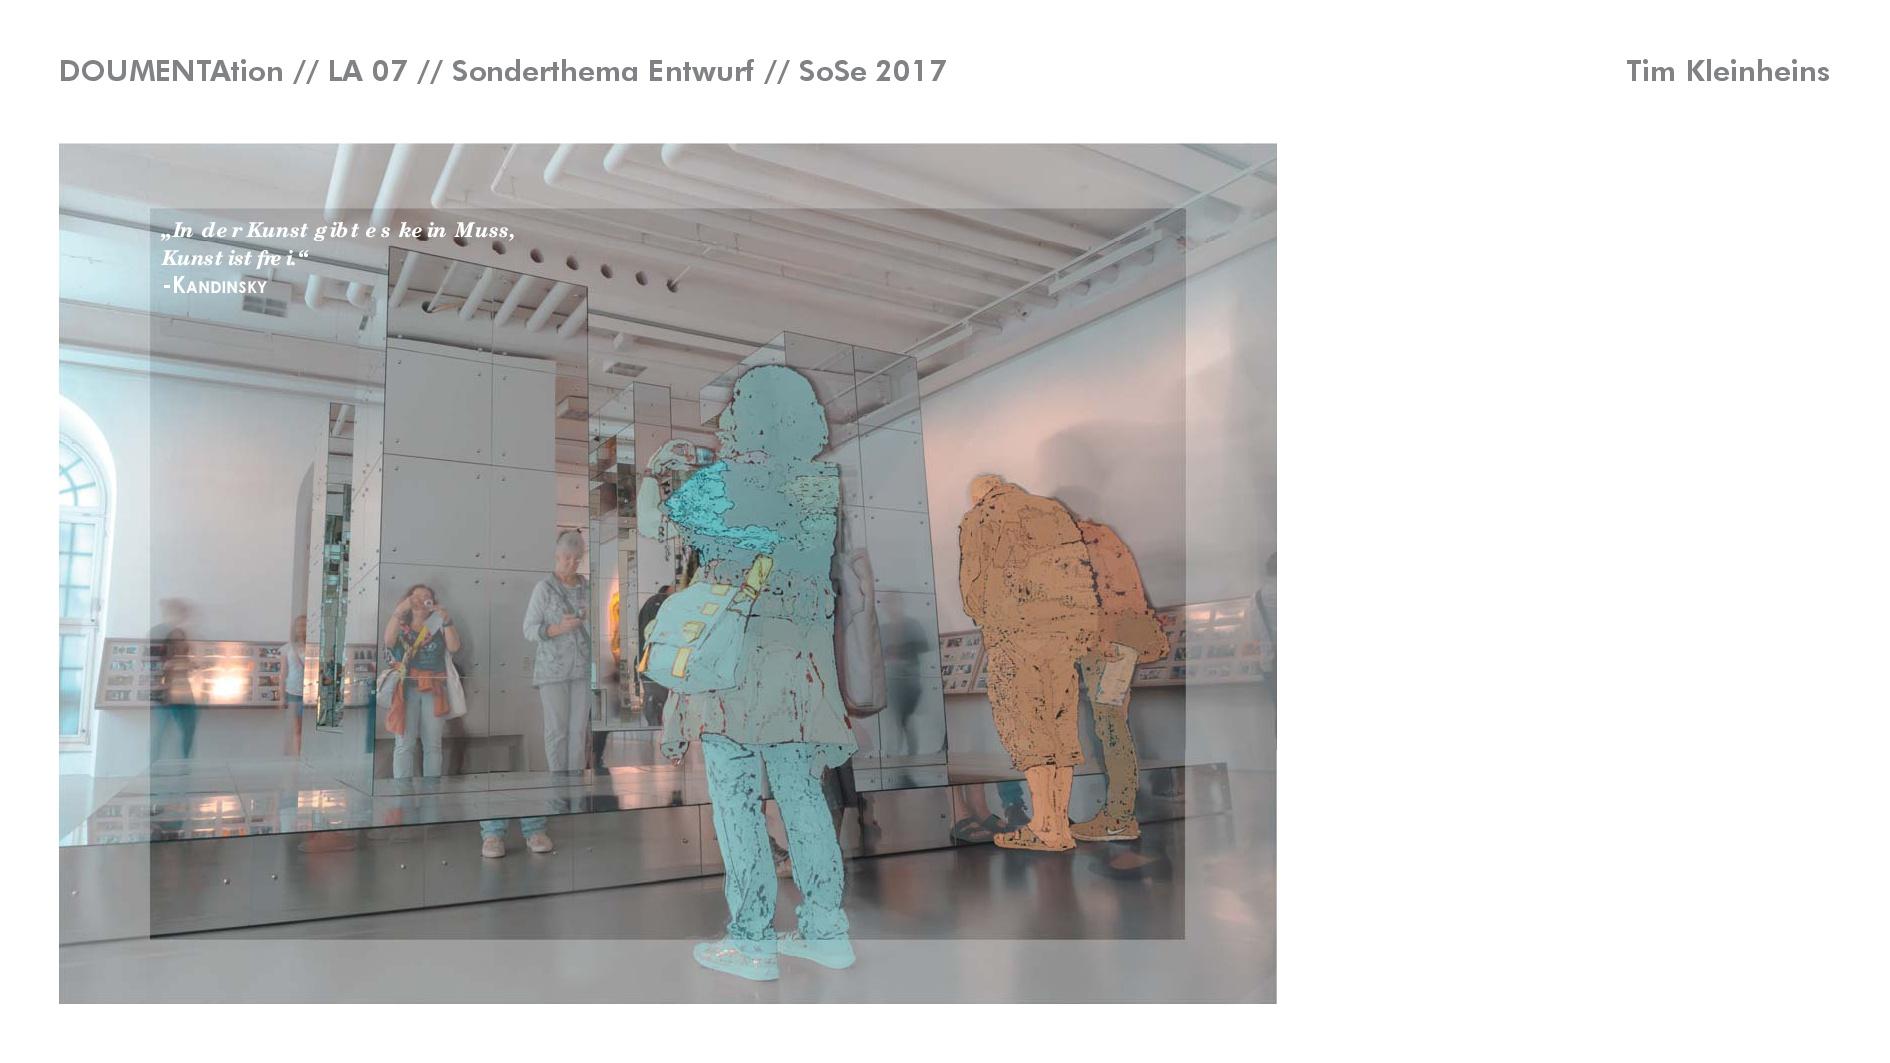 NEU Sonderthema Entwerfen SoSe 17 009